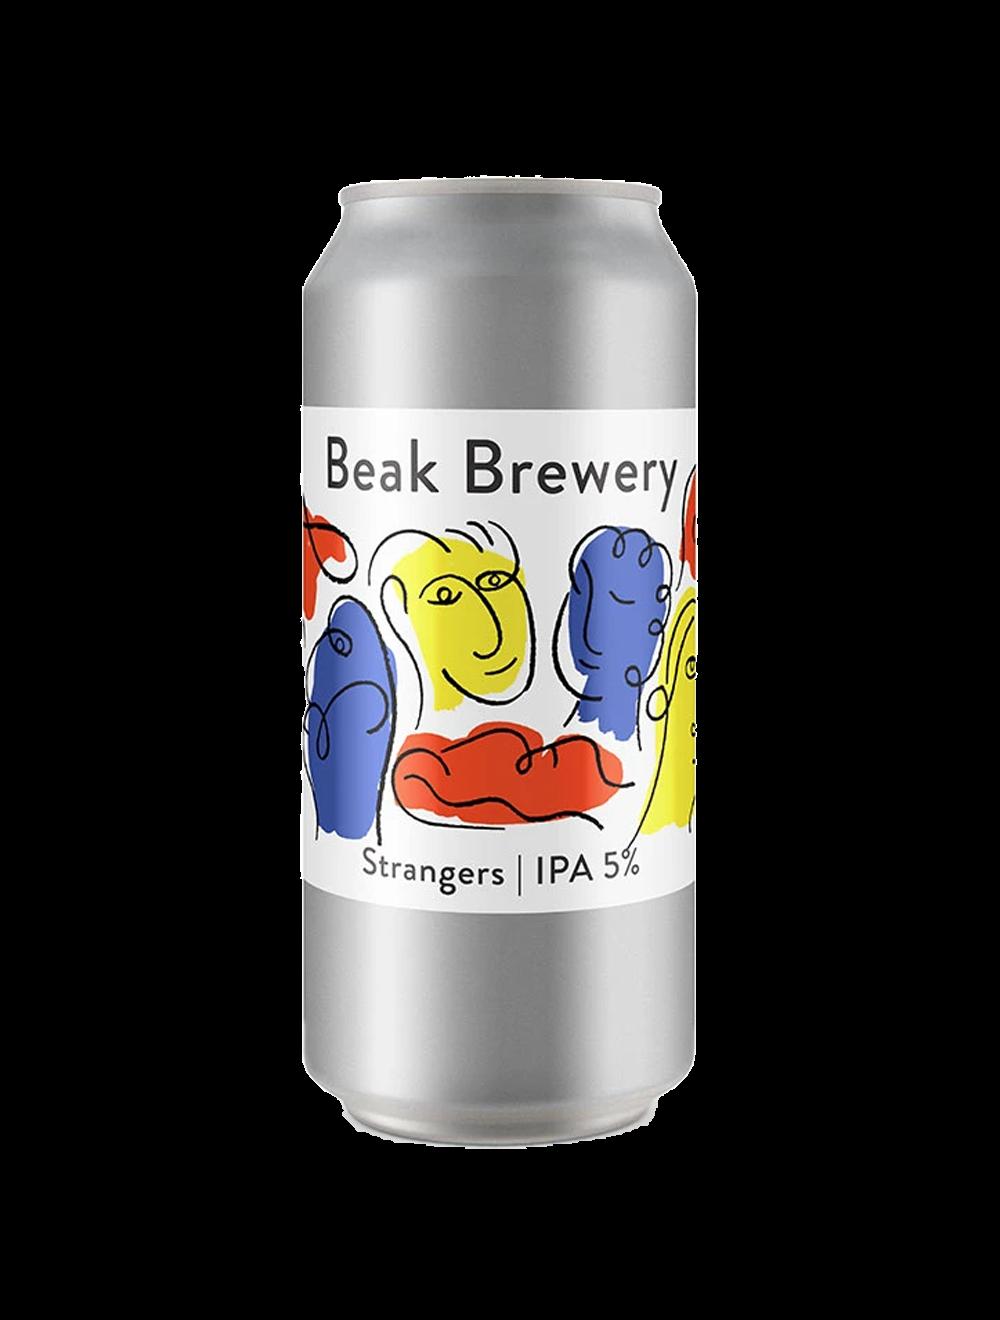 beak brewery strangers can